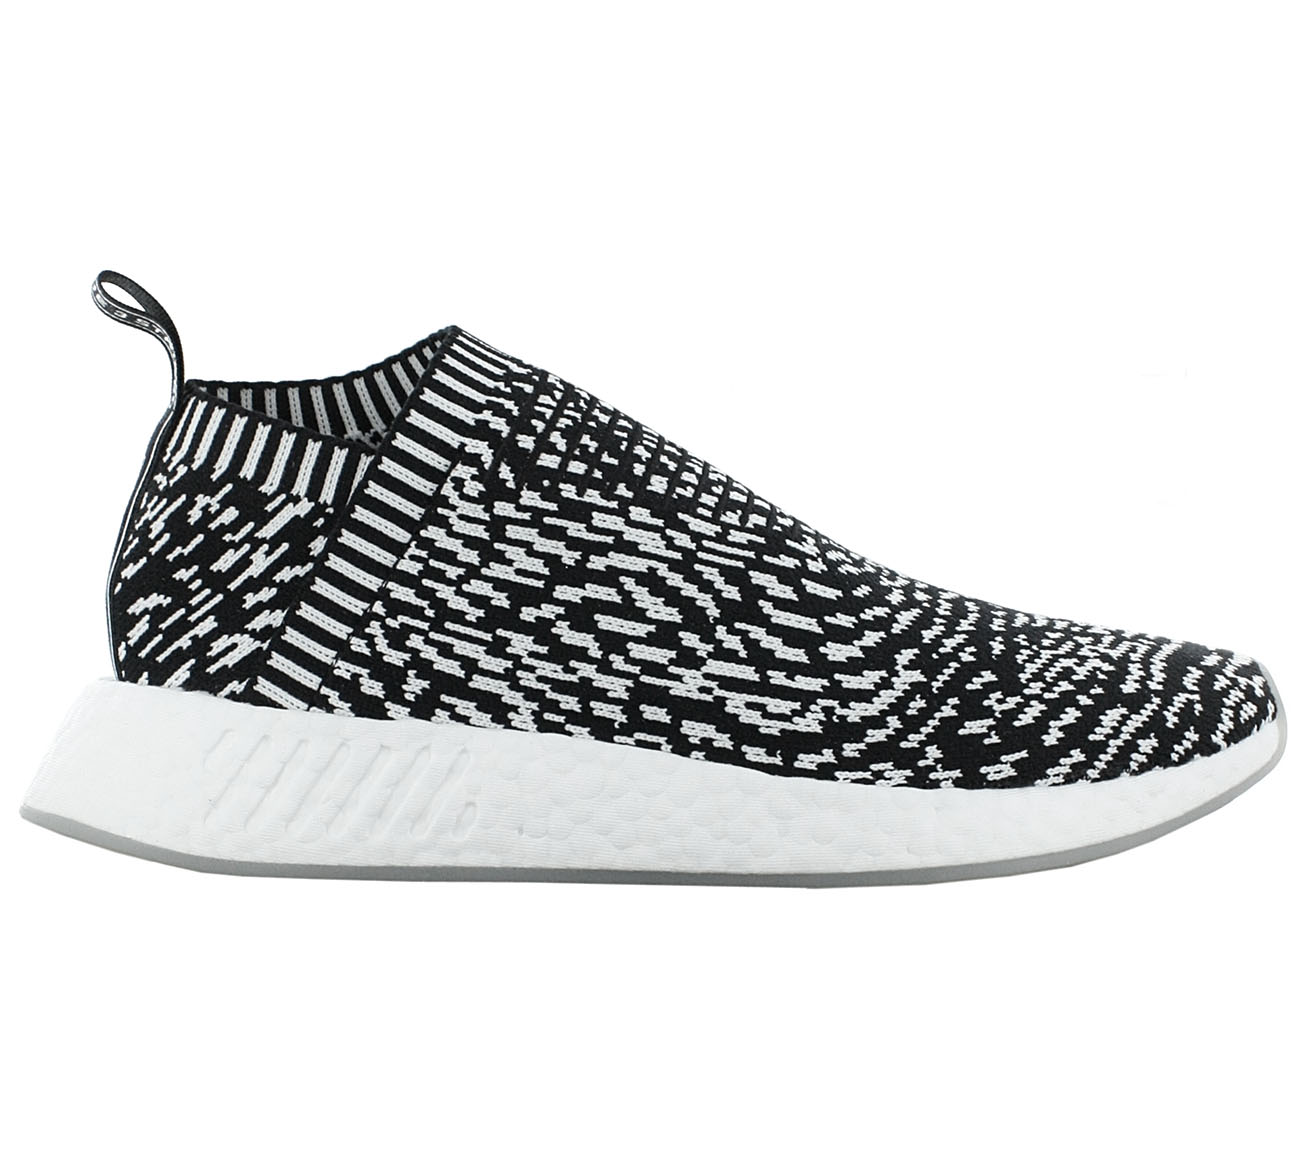 best service 63b0a 6225d Adidas NMD CS2 PK Primeknit boost scarpe sneakers uomo Bianco Nero NUOVO  by3012 - tualu.org